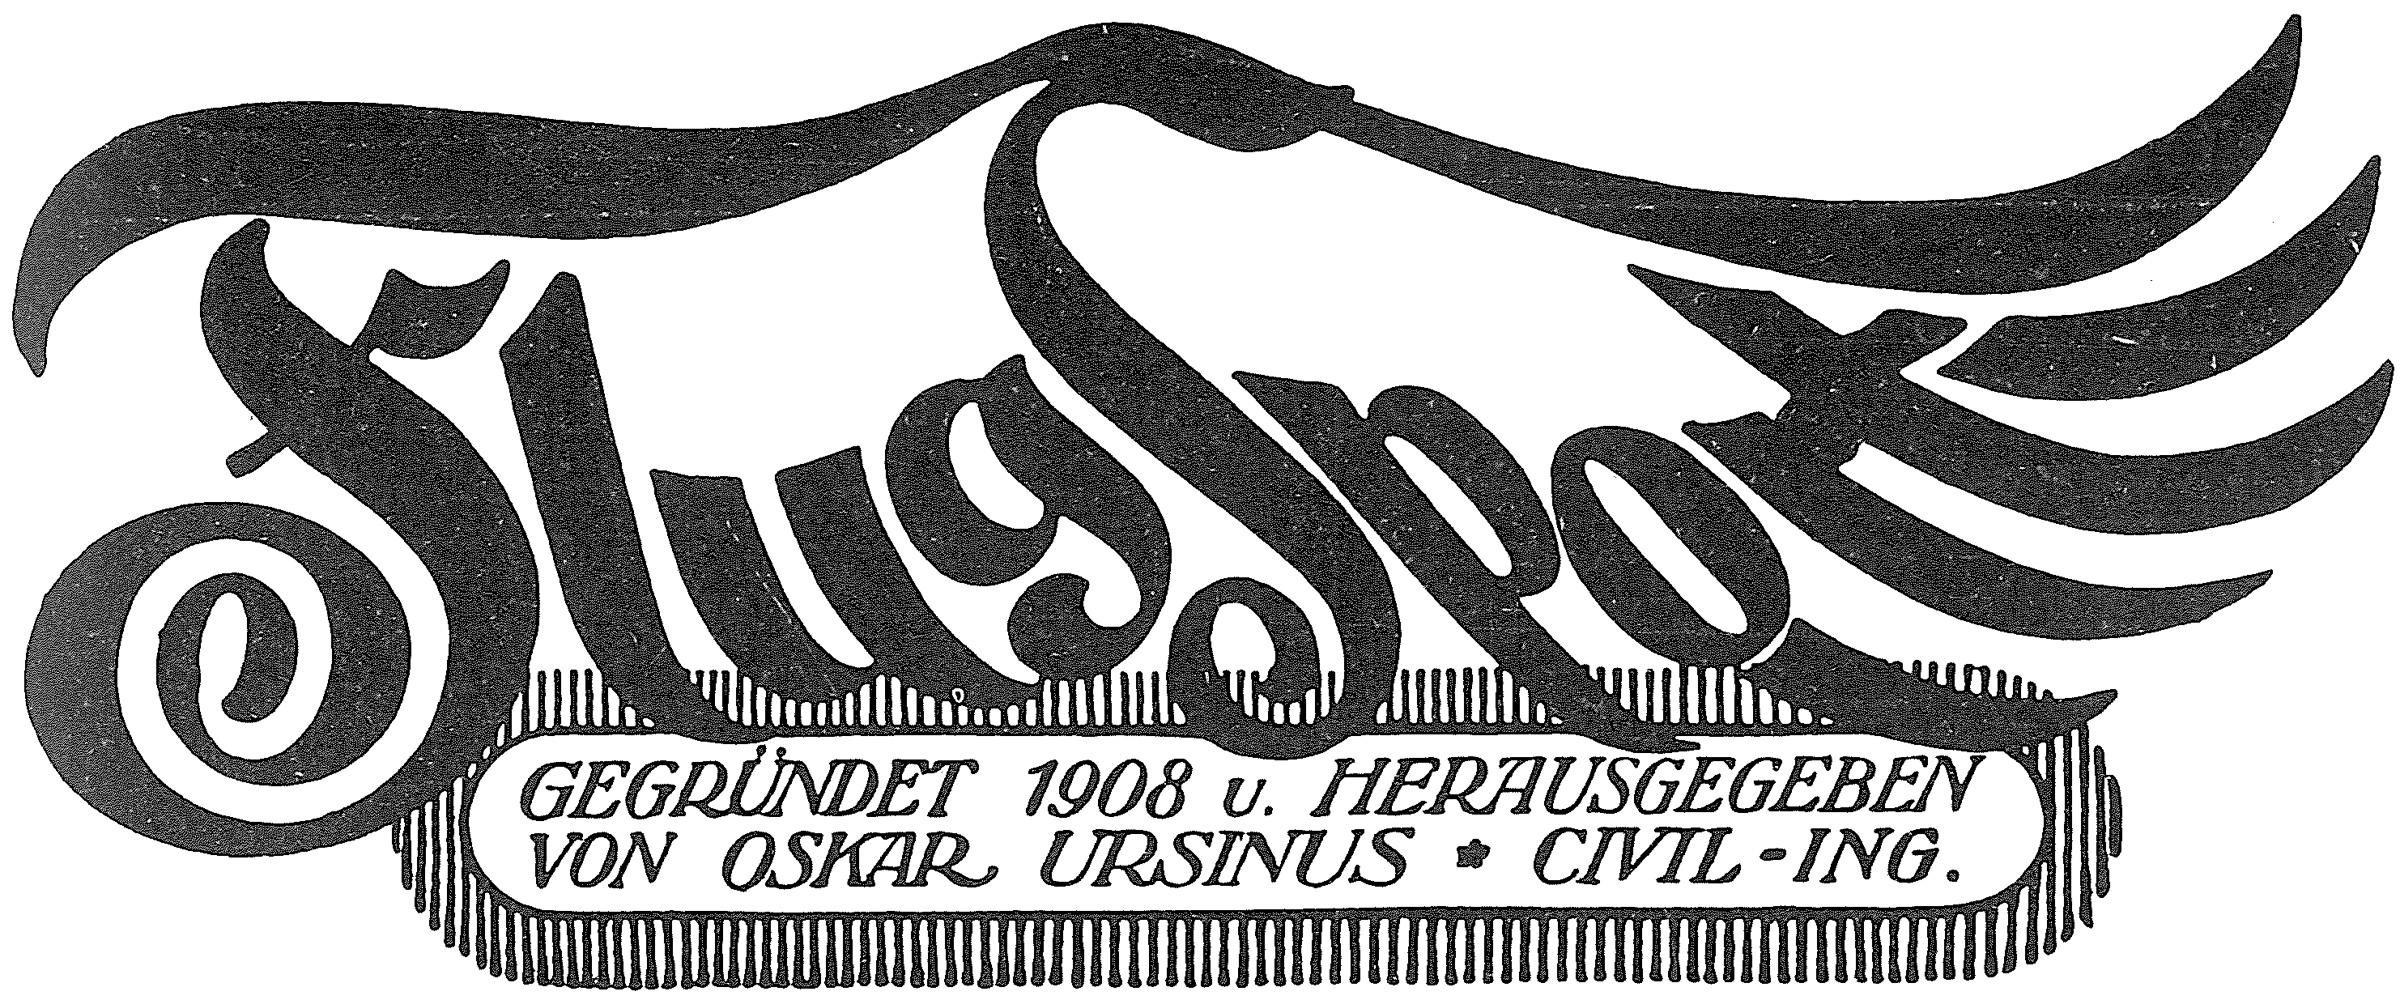 Zeitschrift Flugsport 1912: Motorflug - Gleitflug dedans A 7 Ans Anne Sylvestre